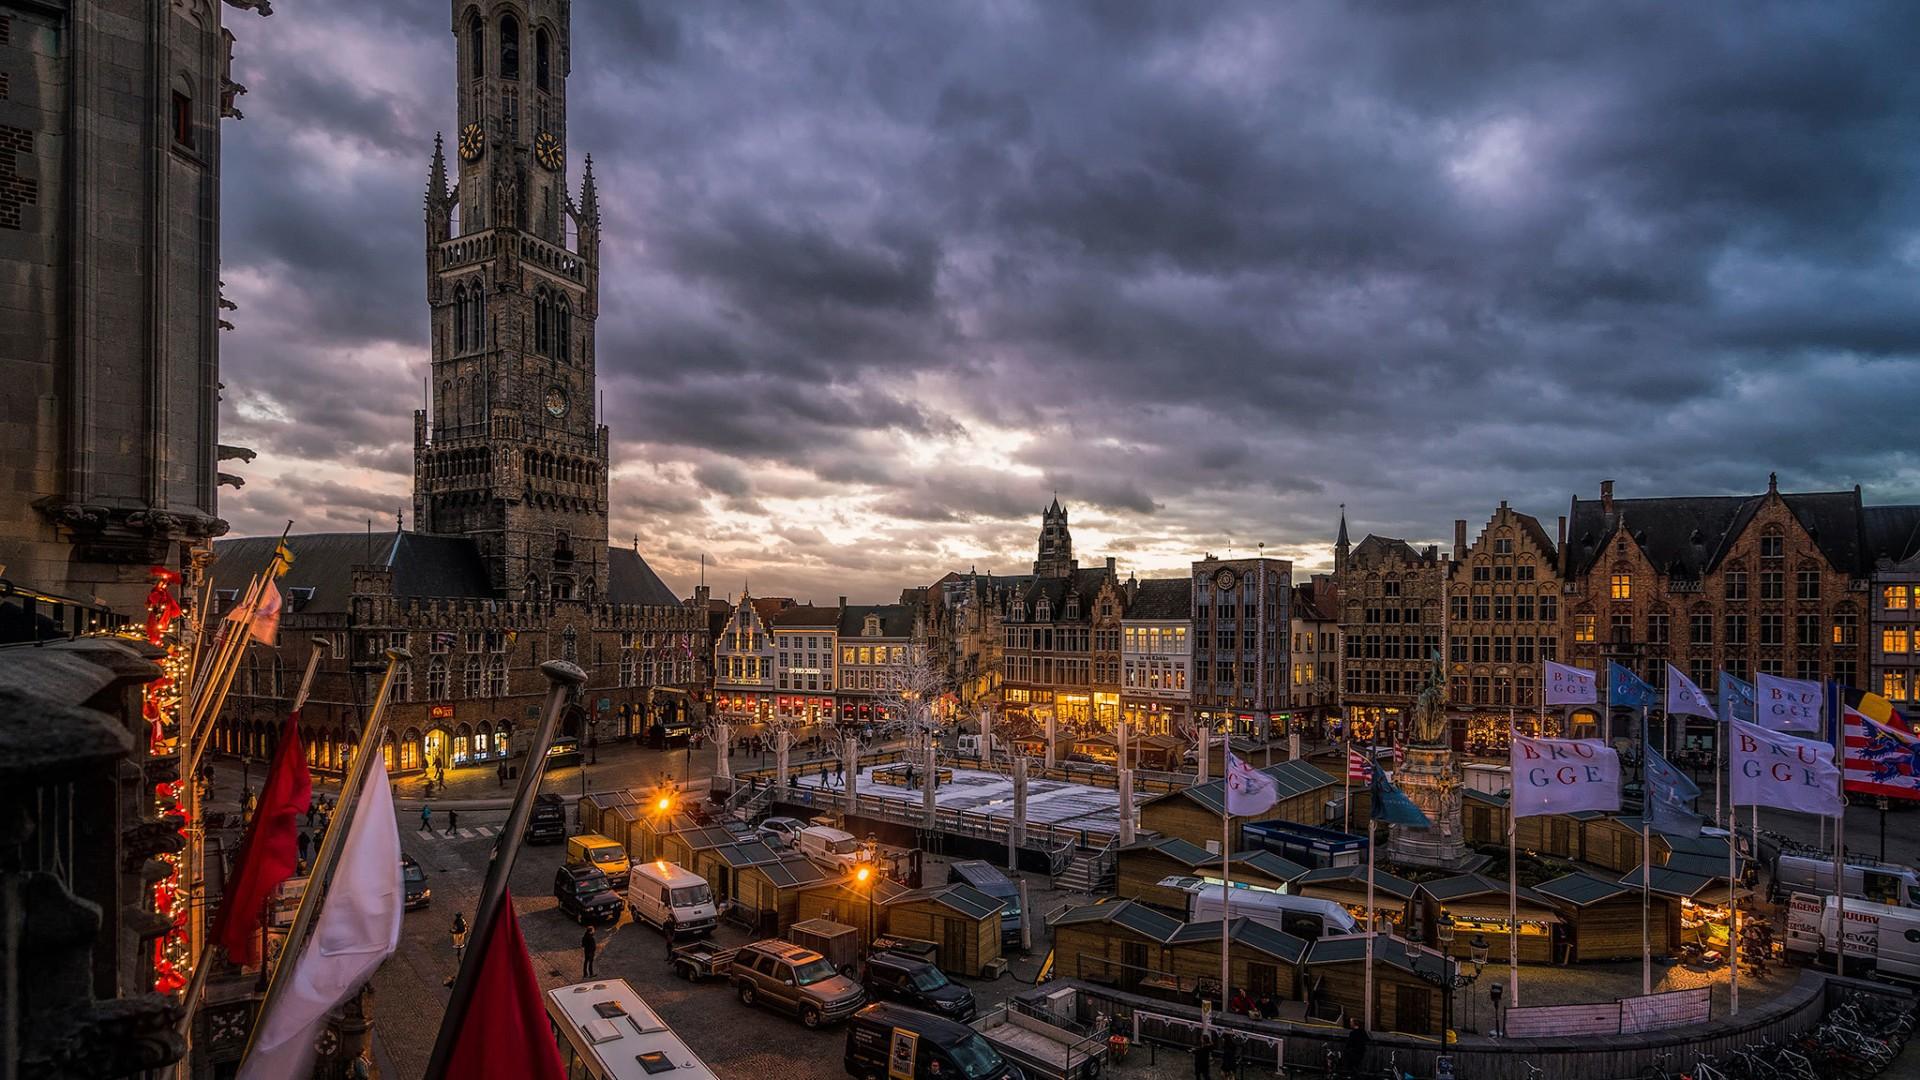 Bruges: Architecture, City, Building, Dusk, Belgium, Bruges, Square